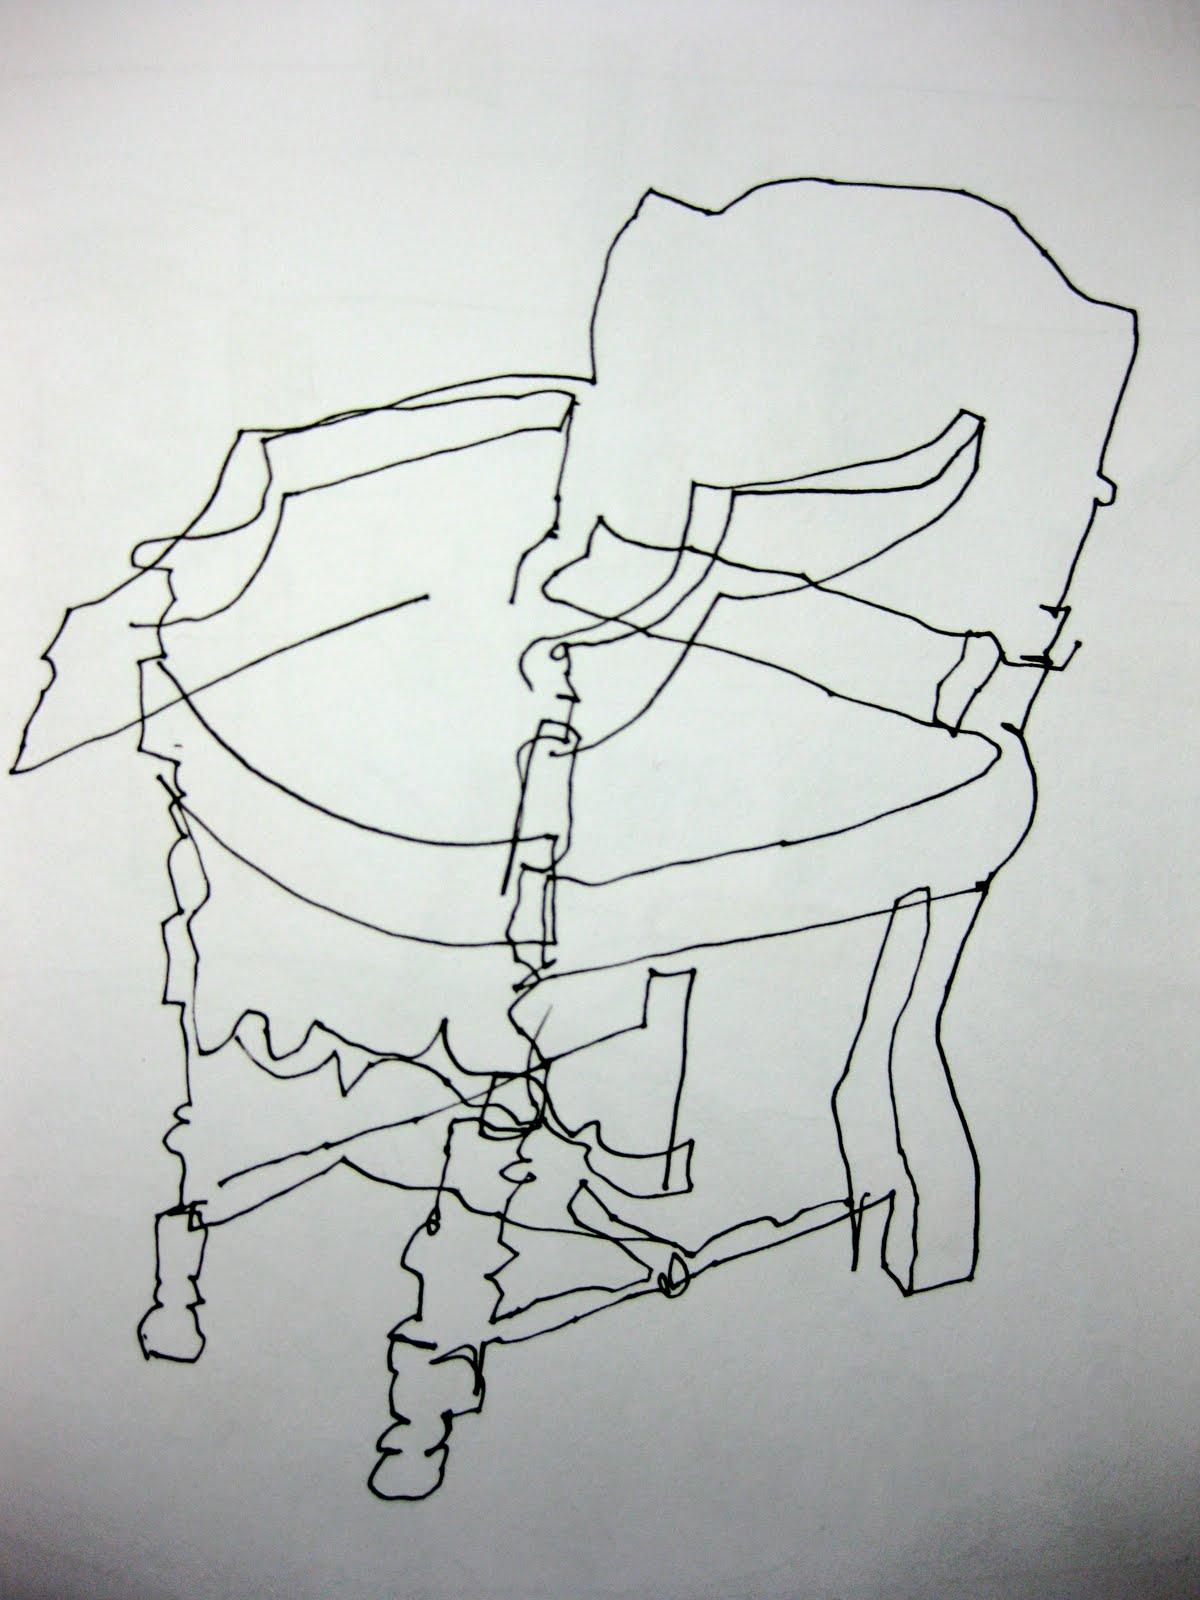 How To Do Contour Line Drawing : Enjoy every day november